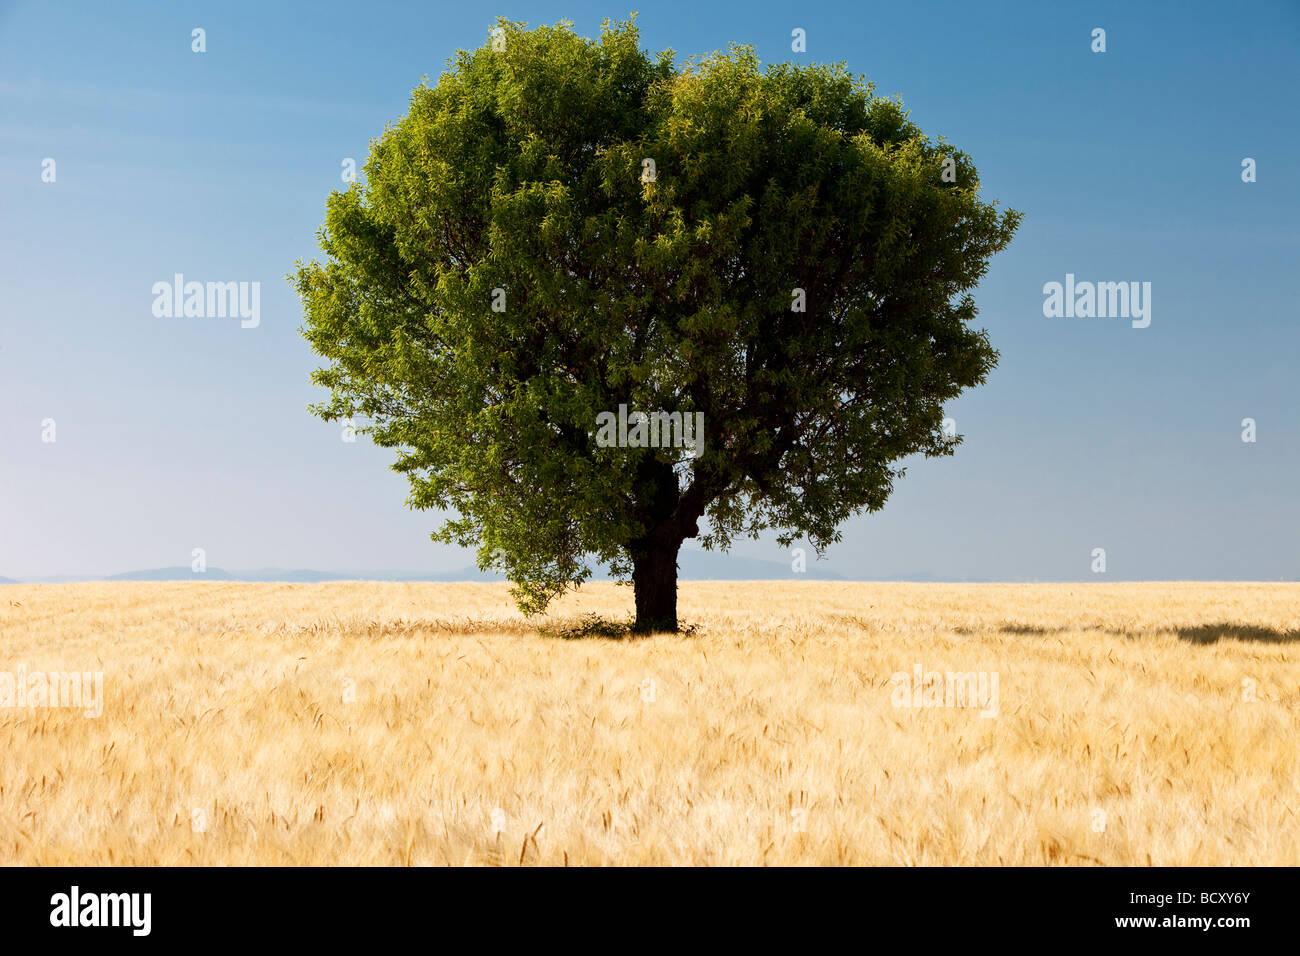 Barley field and tree near Valensole France - Stock Image